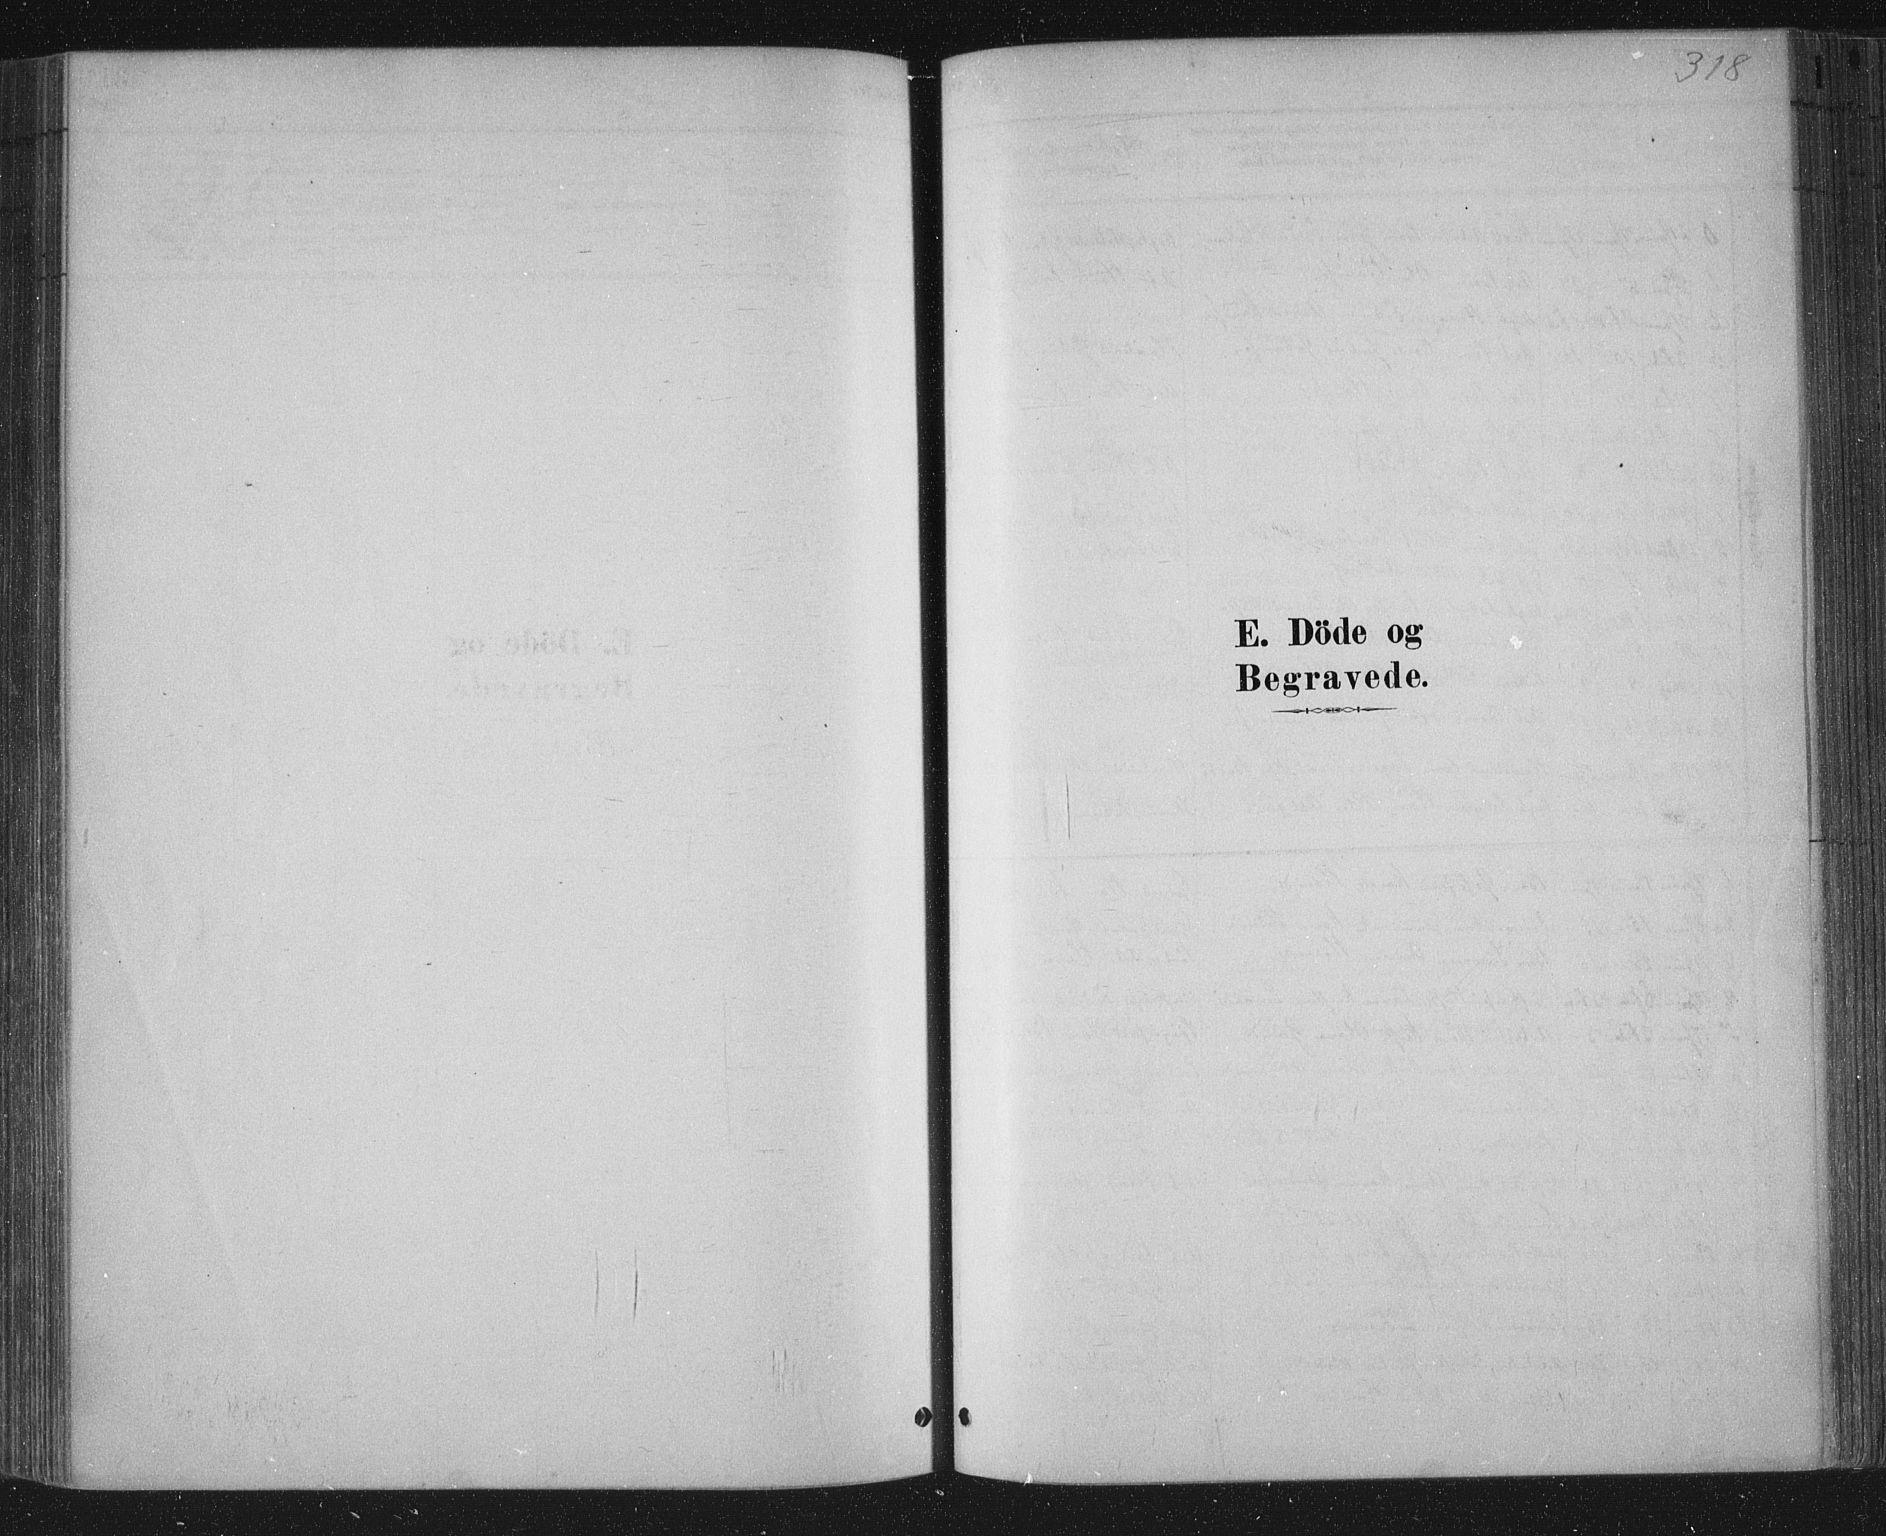 SAKO, Bamble kirkebøker, F/Fa/L0007: Ministerialbok nr. I 7, 1878-1888, s. 318